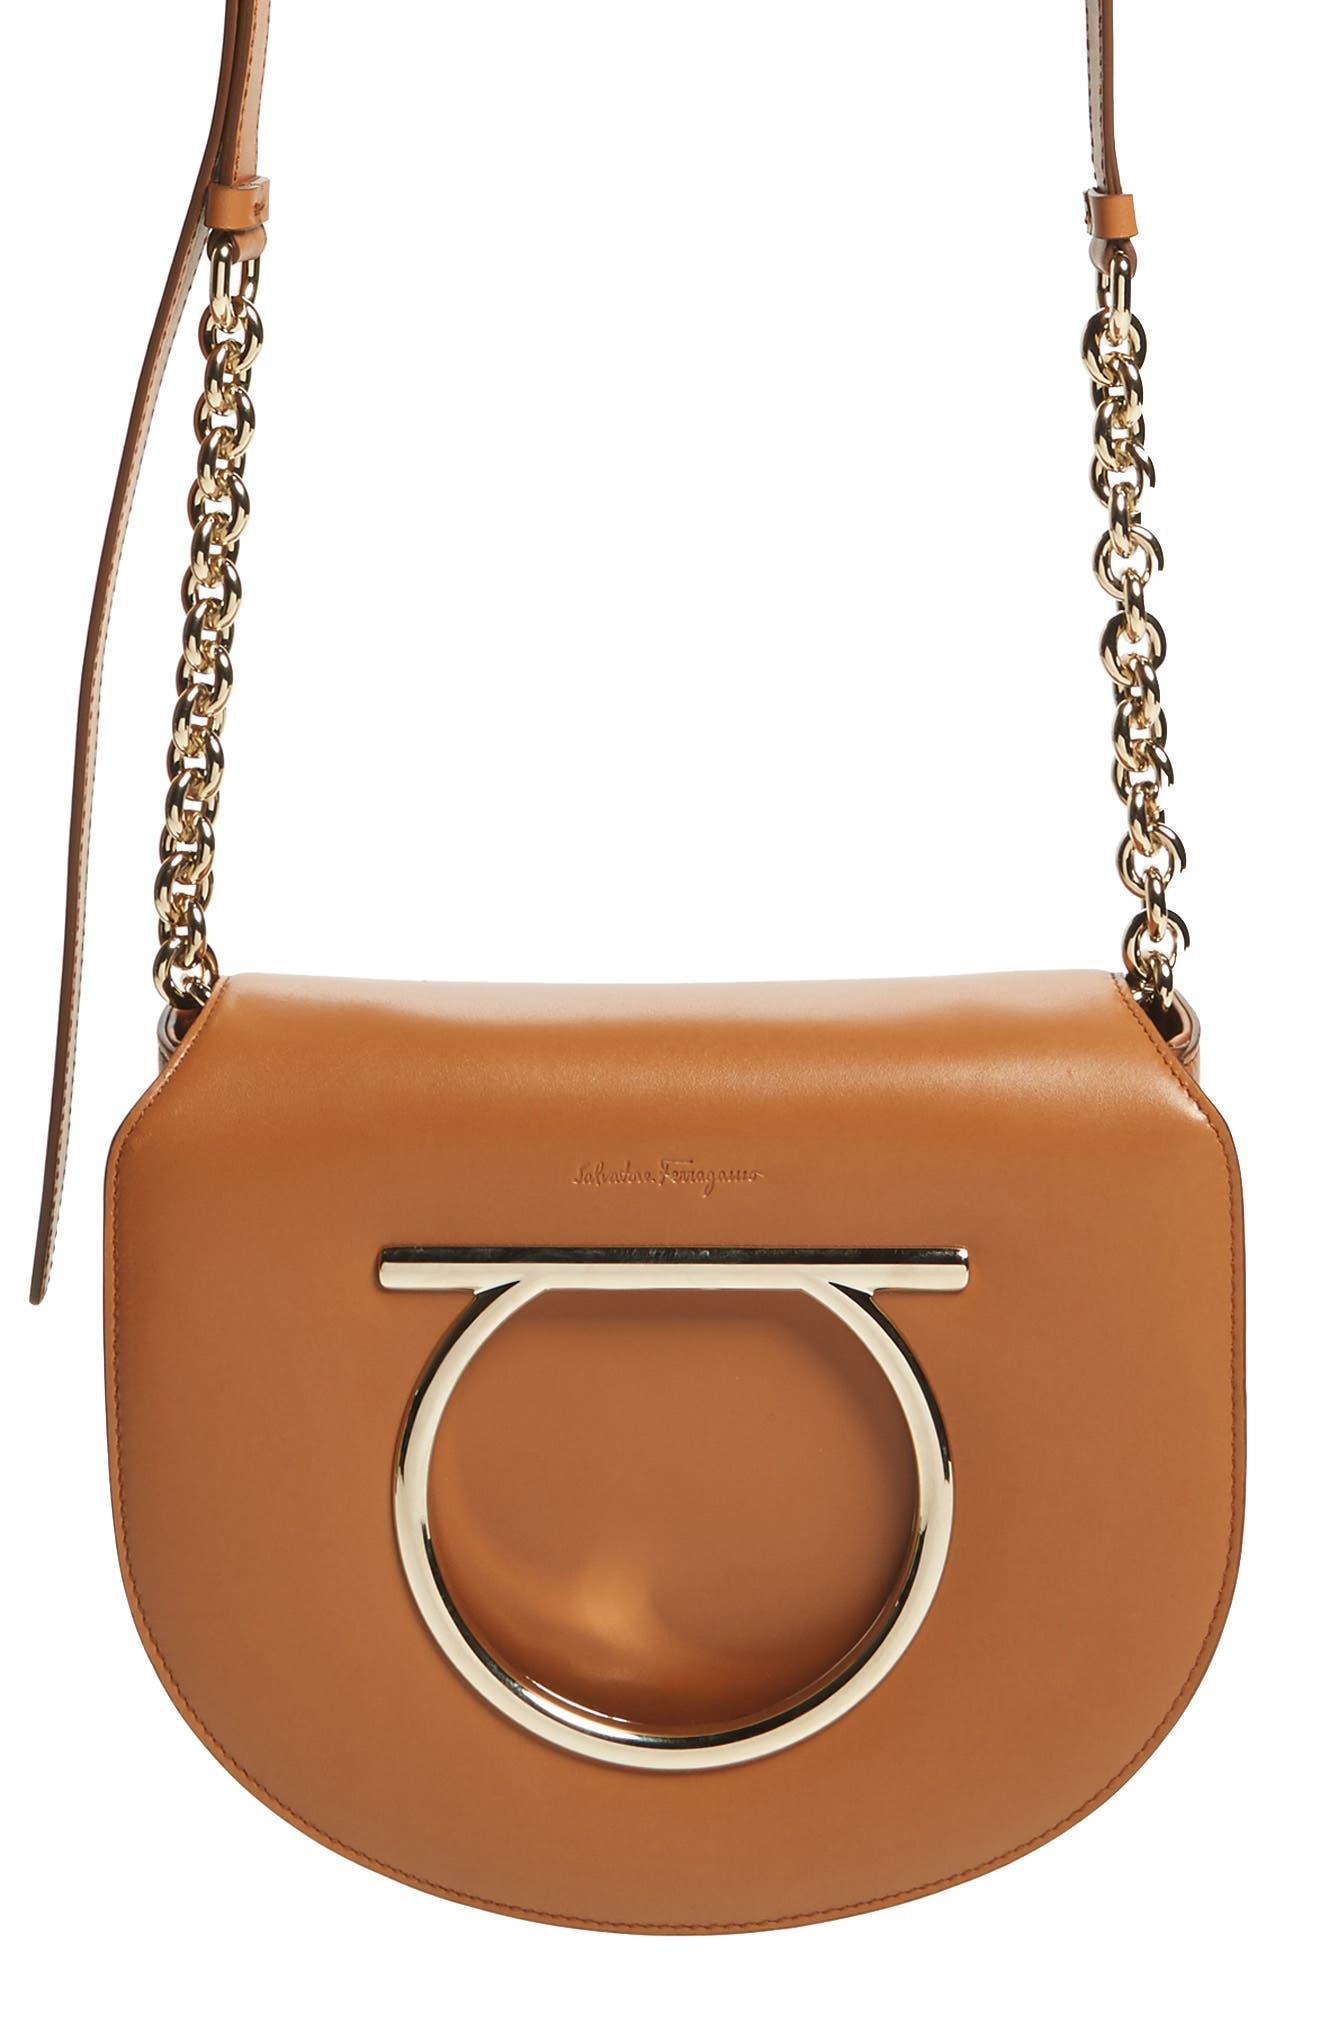 Salvatore Ferragamo Vela Leather Crossbody Bag